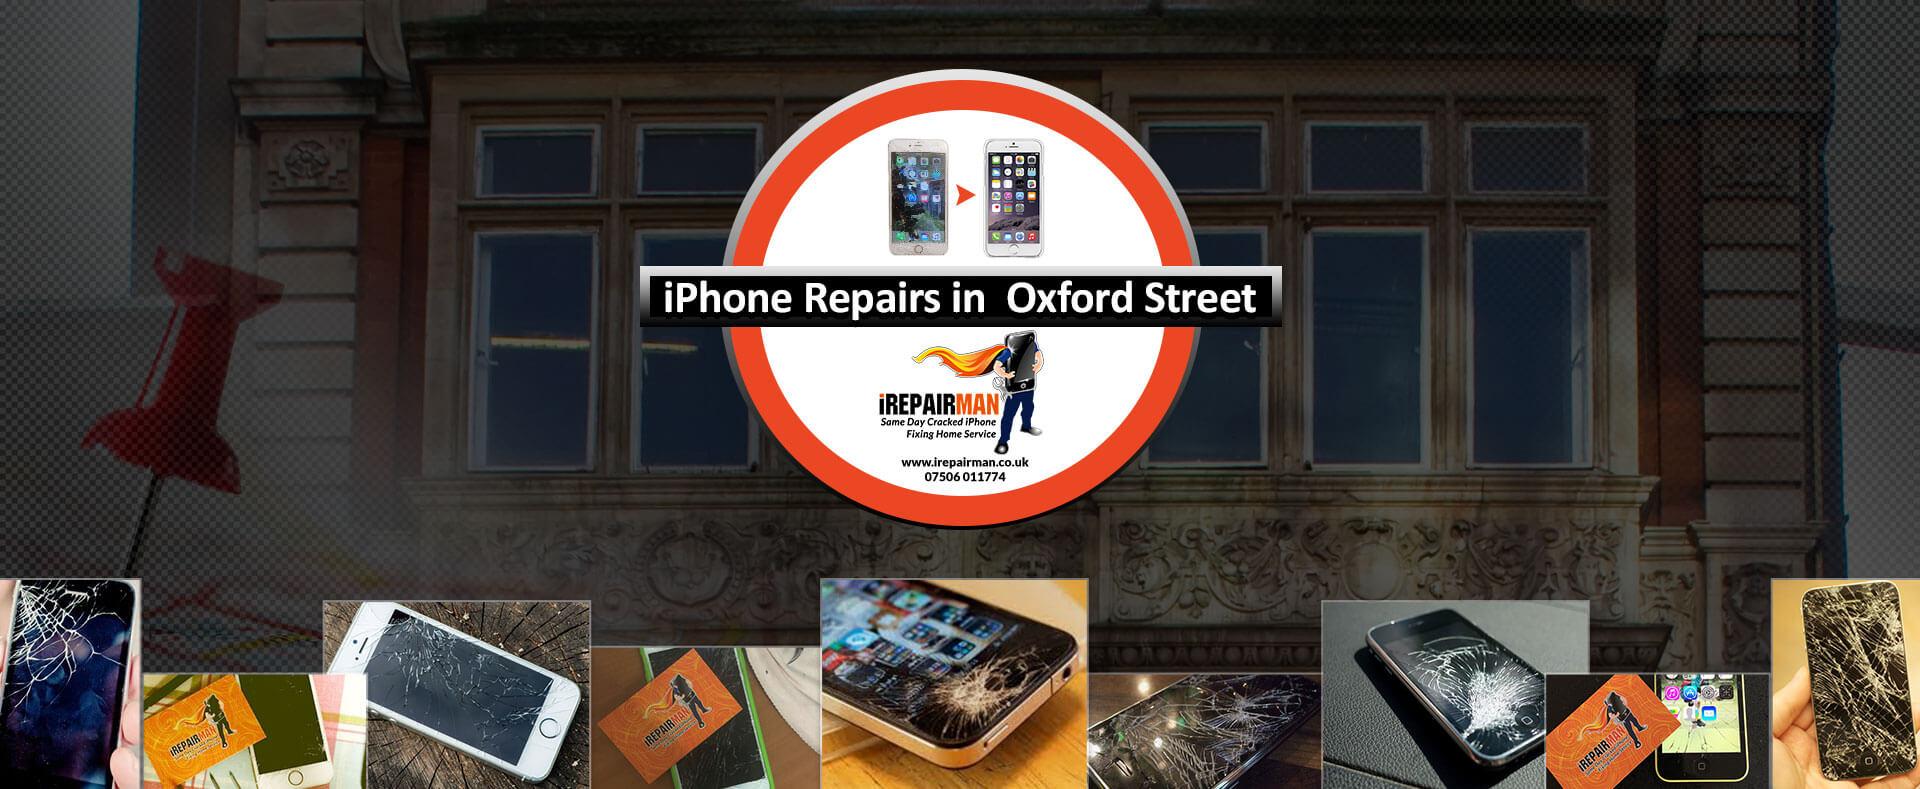 iPhone Repairs in Oxford Street